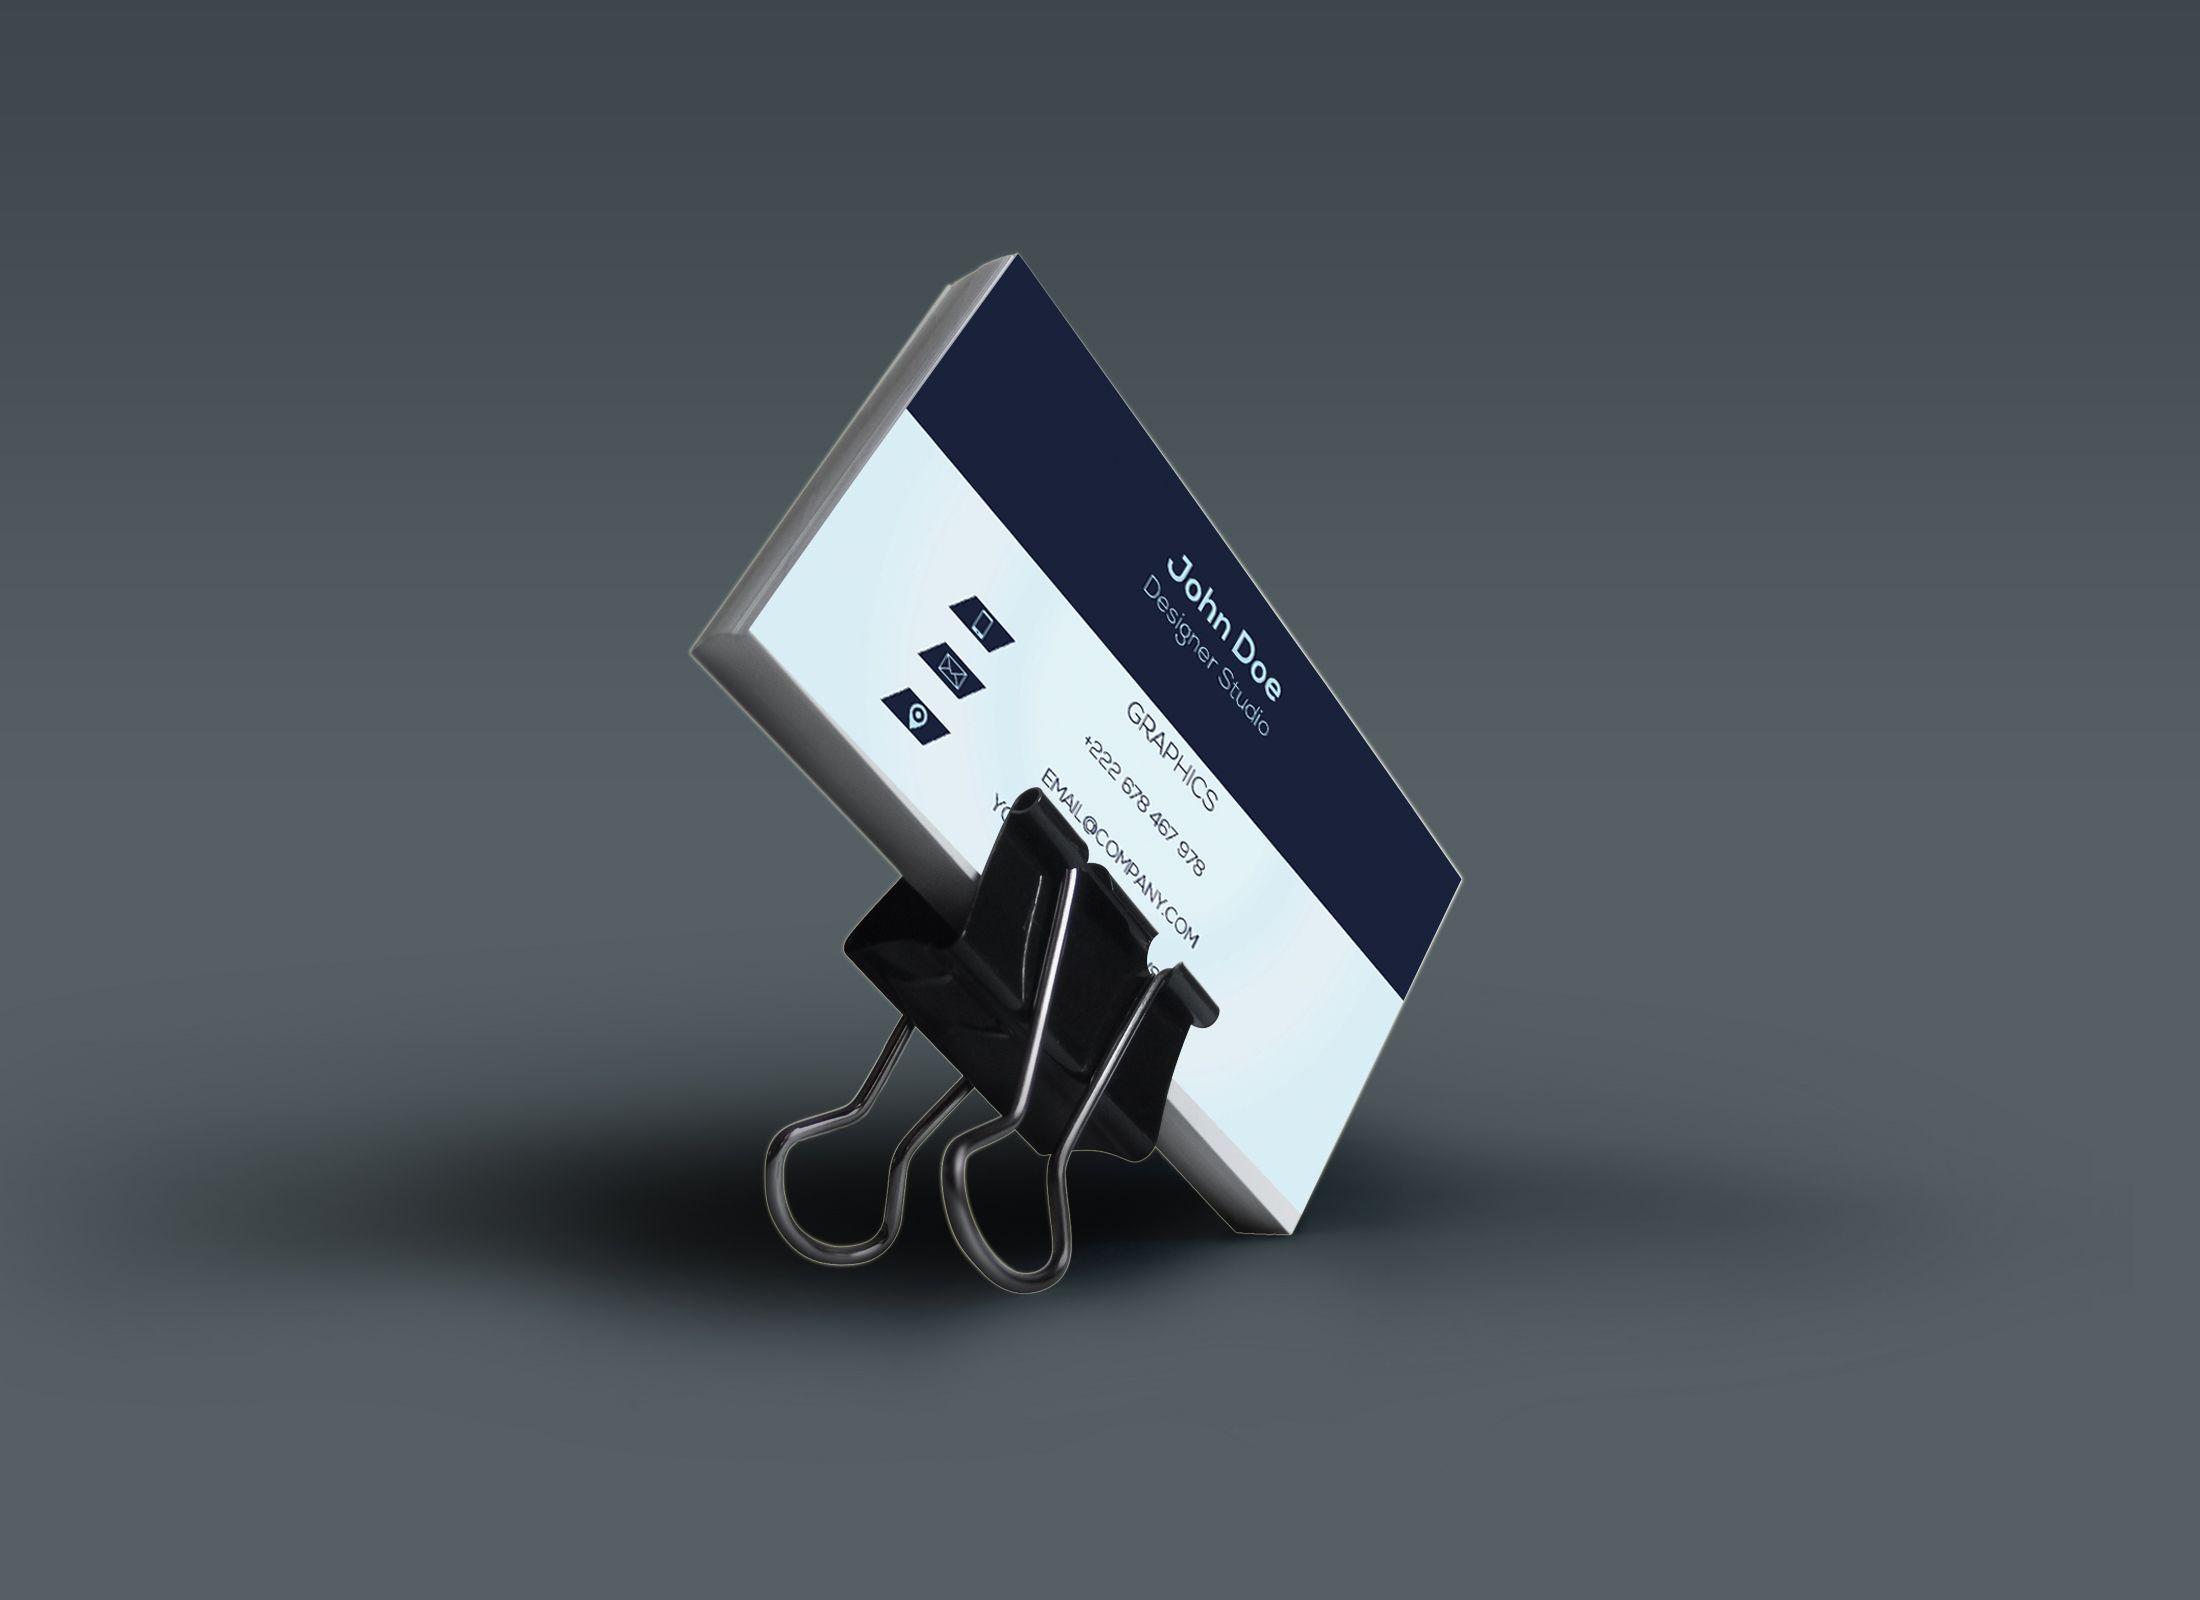 Professional business card design templates professional business professional business card design templates professional business card design graphic design inspiration flashek Images